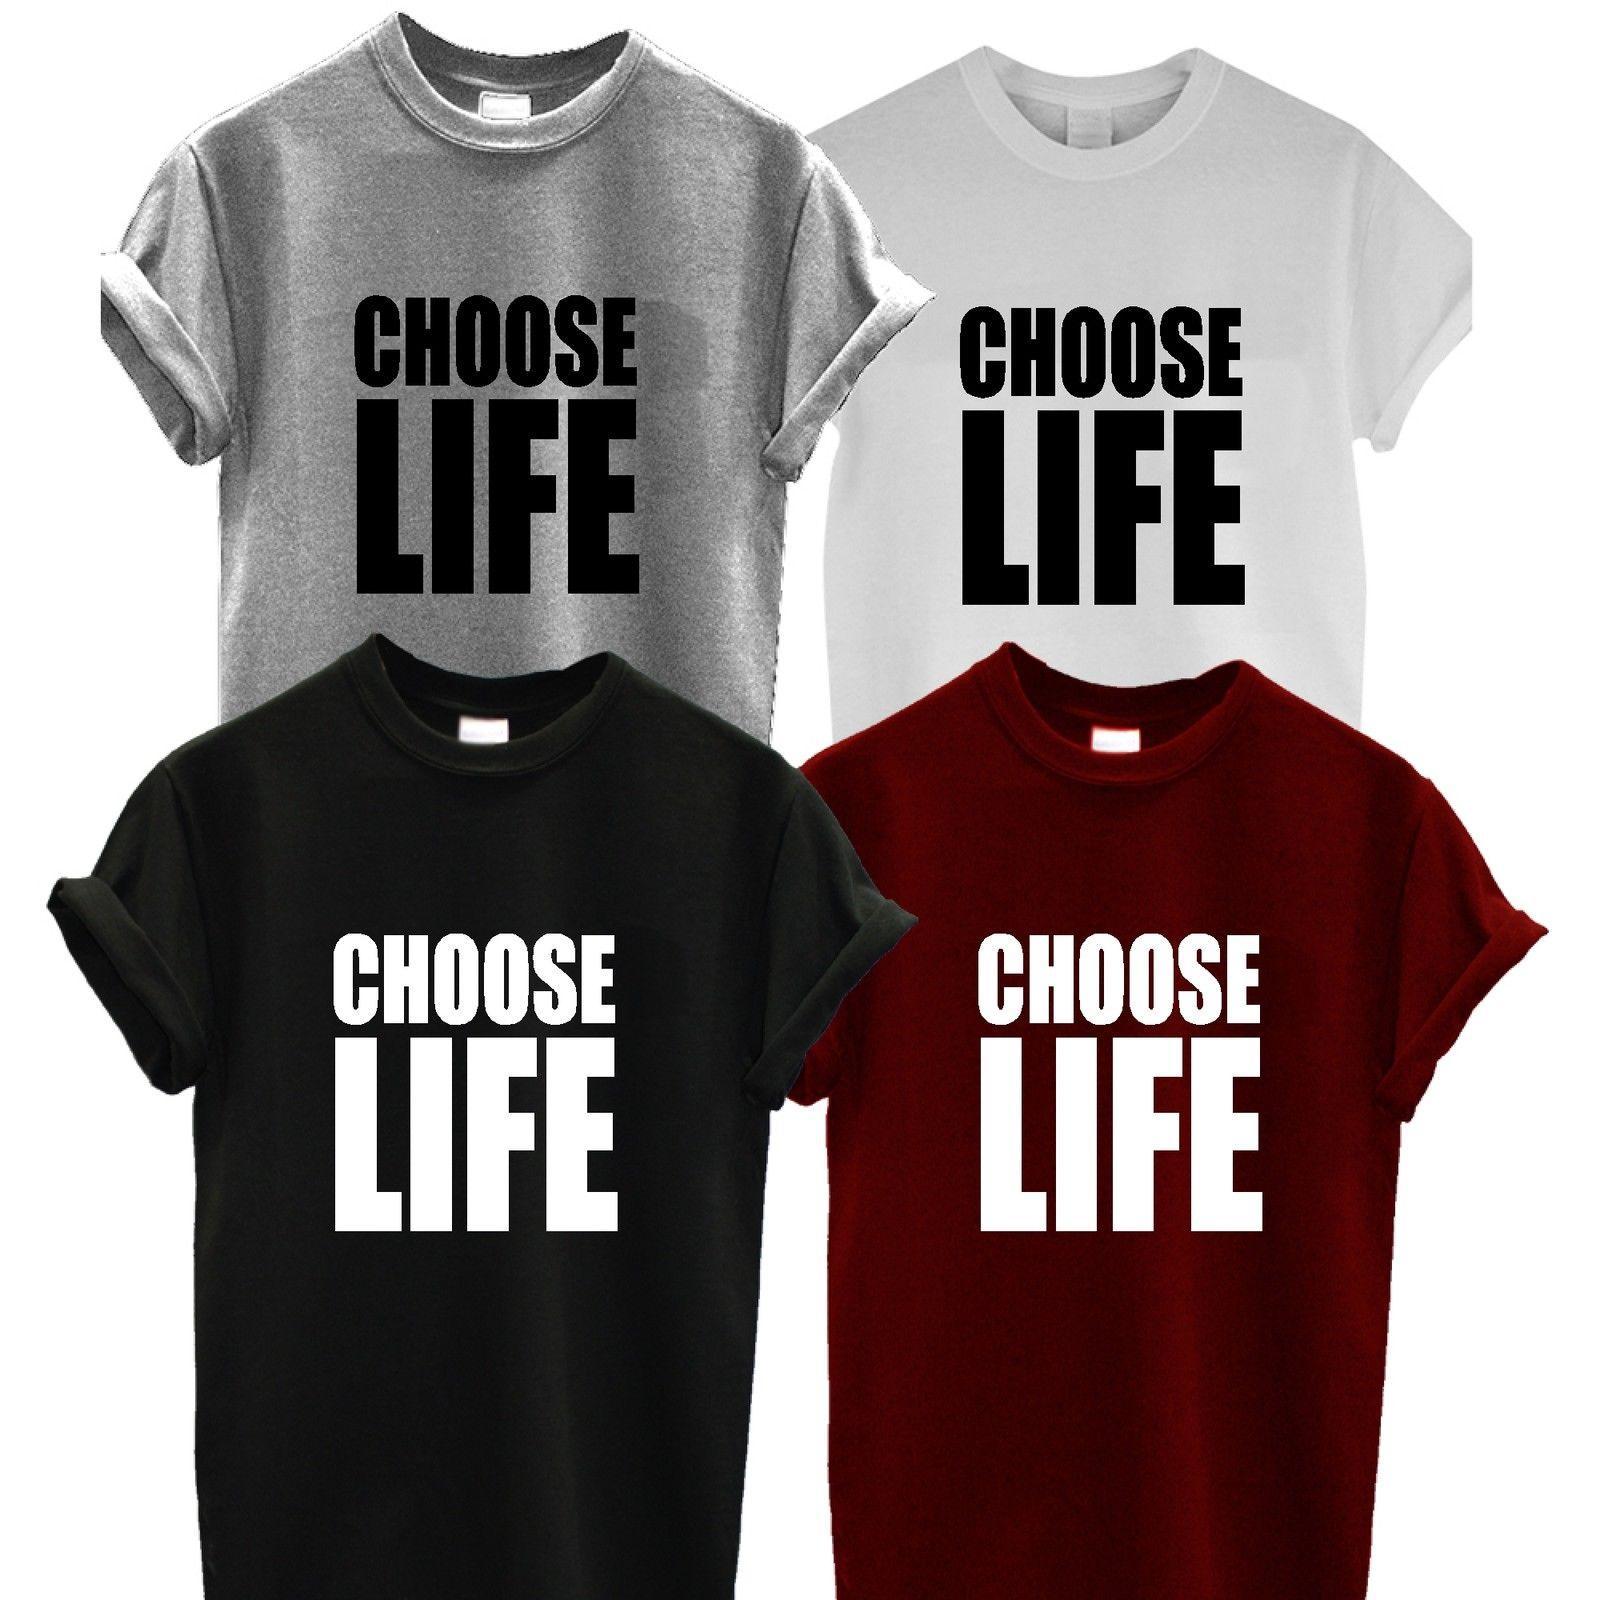 0ae209dde CHOOSE LIFE T SHIRT UNISEX Tee Top Wham Retro Fancy Dress George Michael  80's XX Funny free shipping Unisex Casual gift